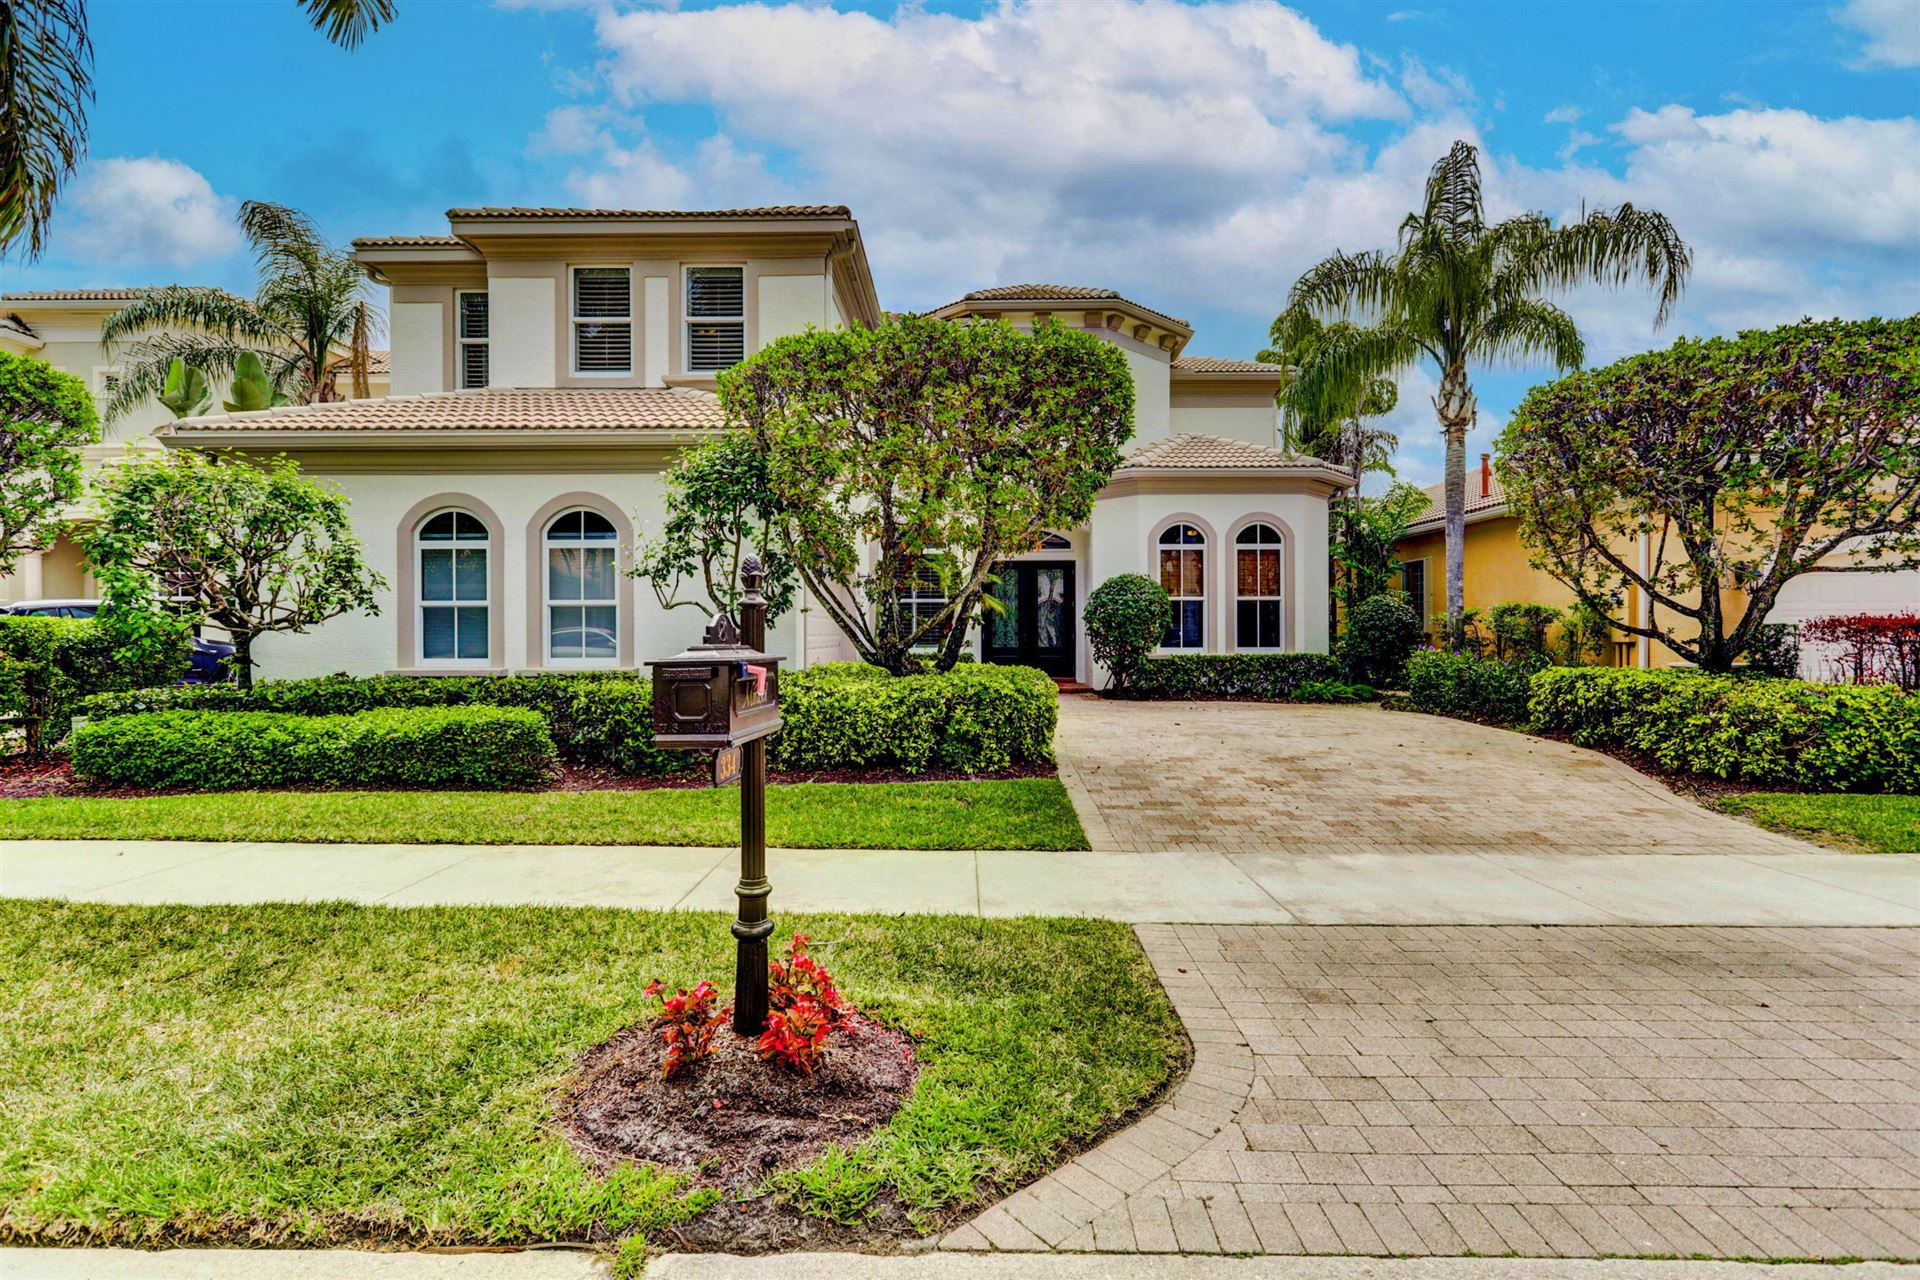 Photo of 334 Vizcaya Drive, Palm Beach Gardens, FL 33418 (MLS # RX-10712572)